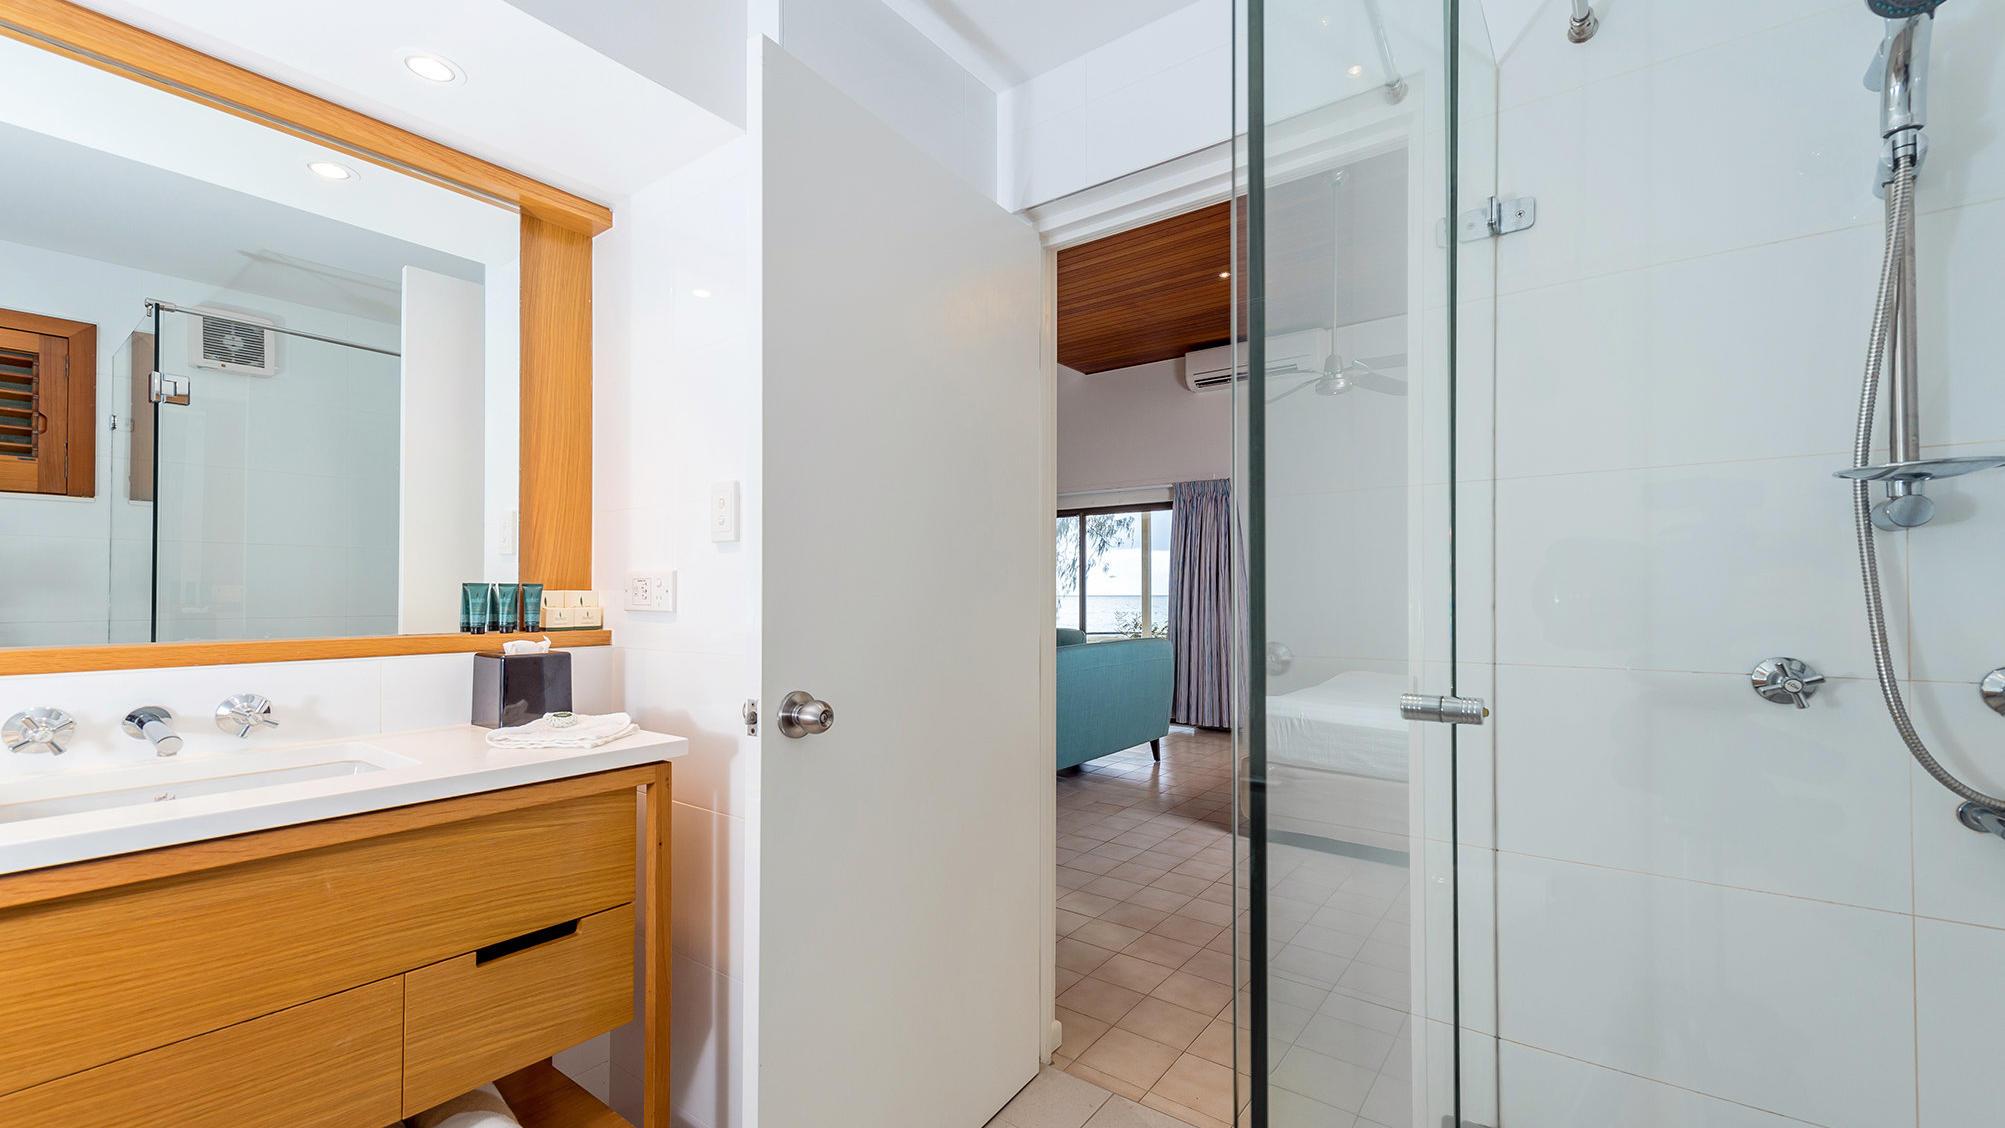 Point Suite at Heron Island Resort in Queensland, Australia